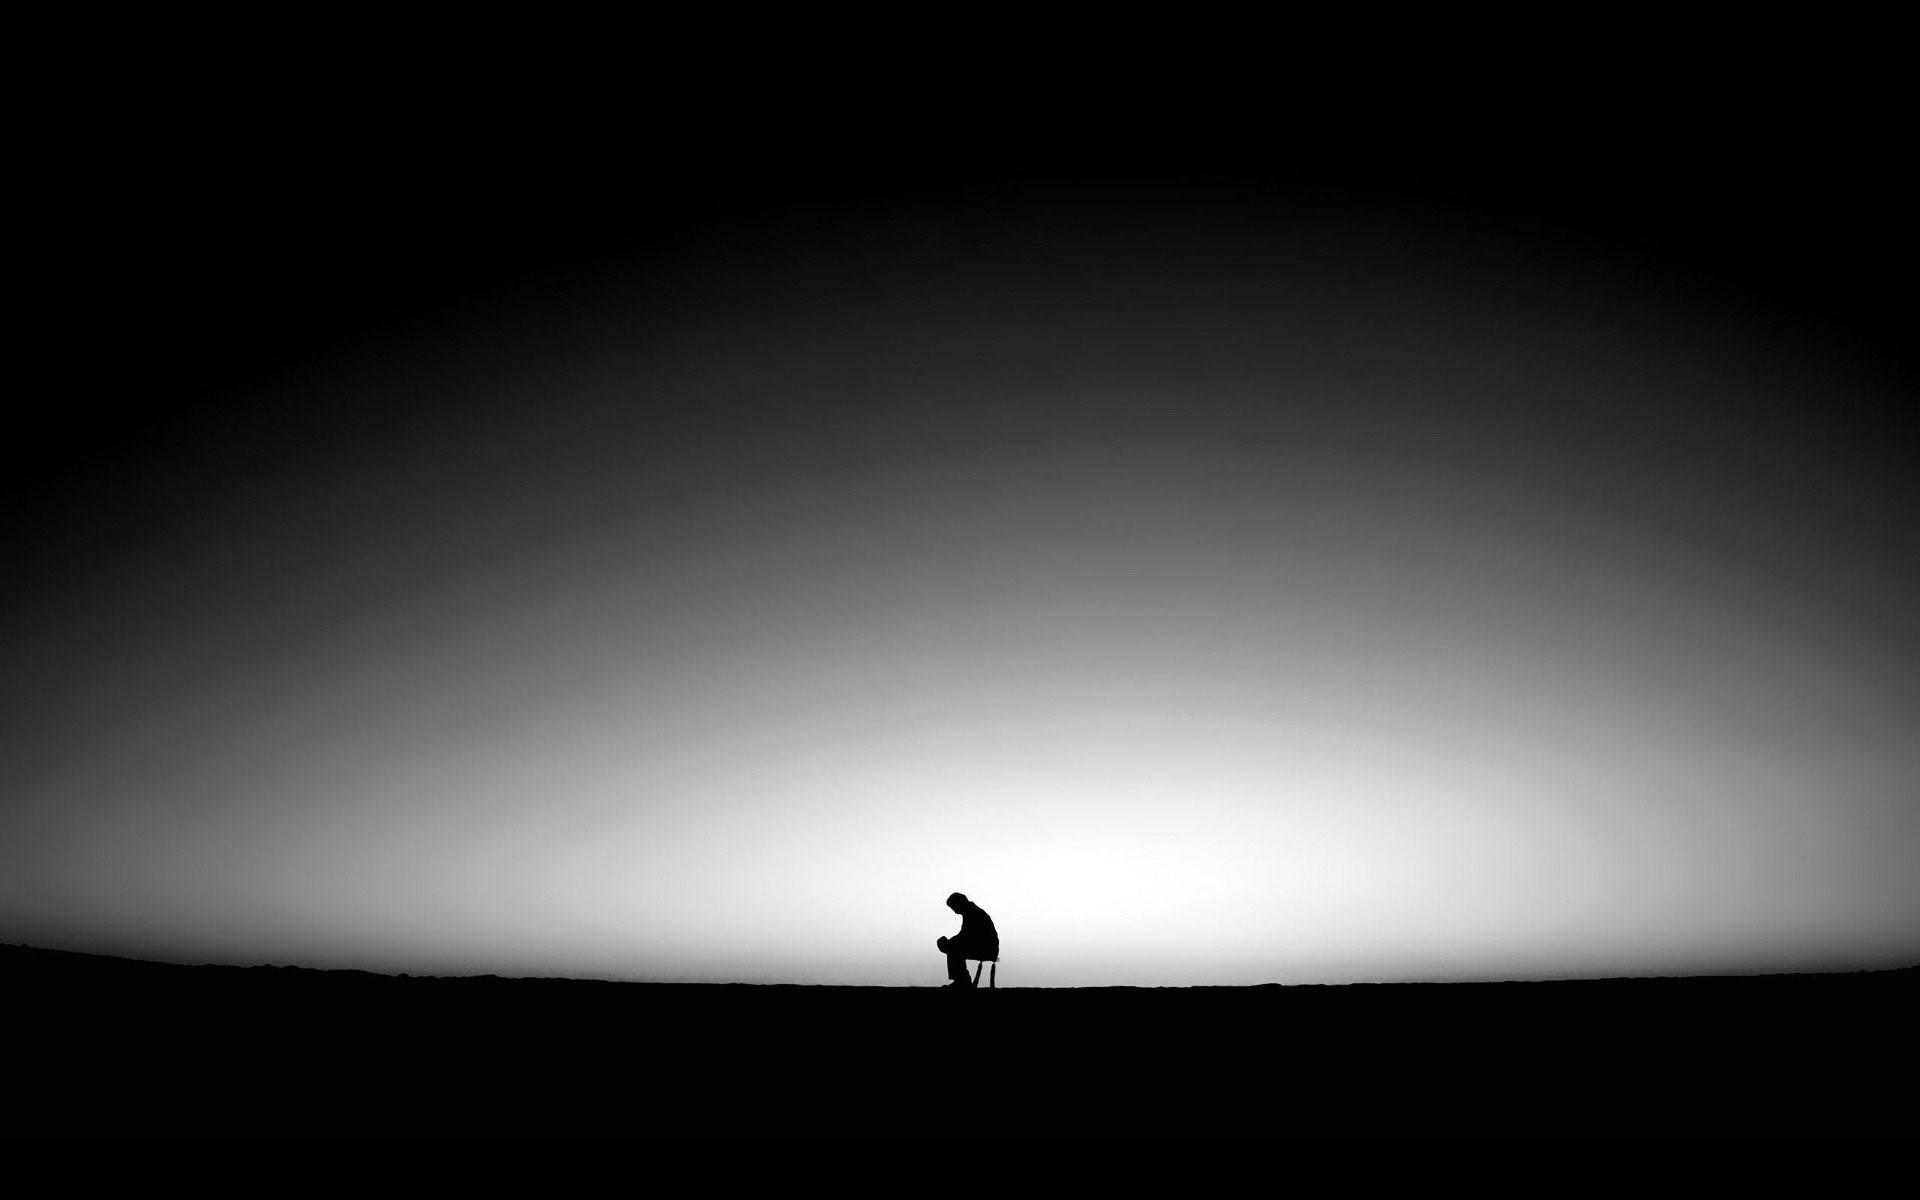 Lonely Sad Boy Wallpaper  vel